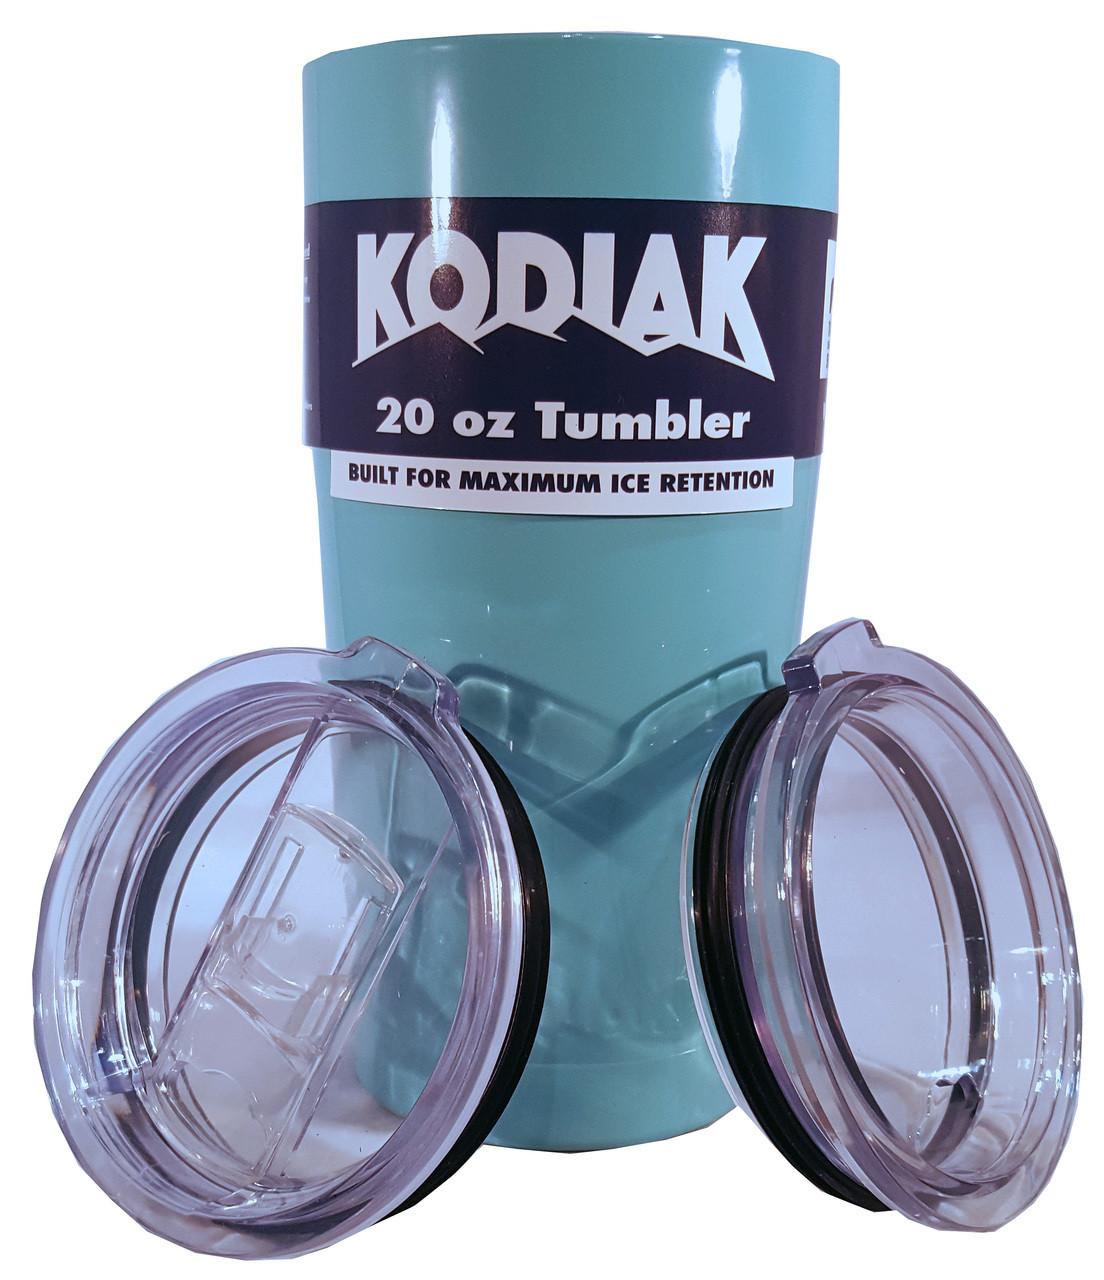 CLEARANCE - 20oz Kodiak Tundra Tumbler w/ 2 Lids - Powder Coated Stainless - FREE SHIPPING!